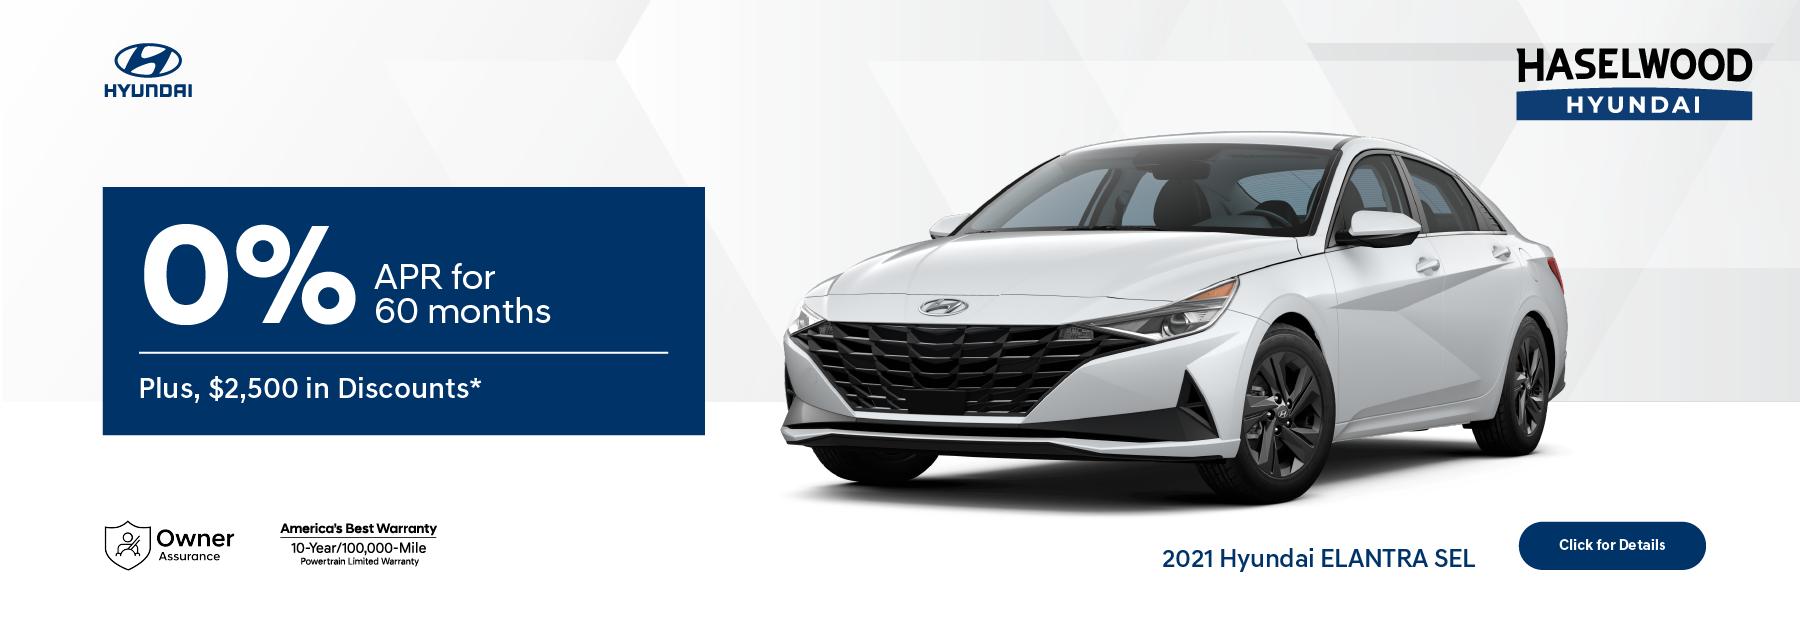 11768 – JUN21 – Hyundai Incentive – Web Slides_Elantra – Desktop